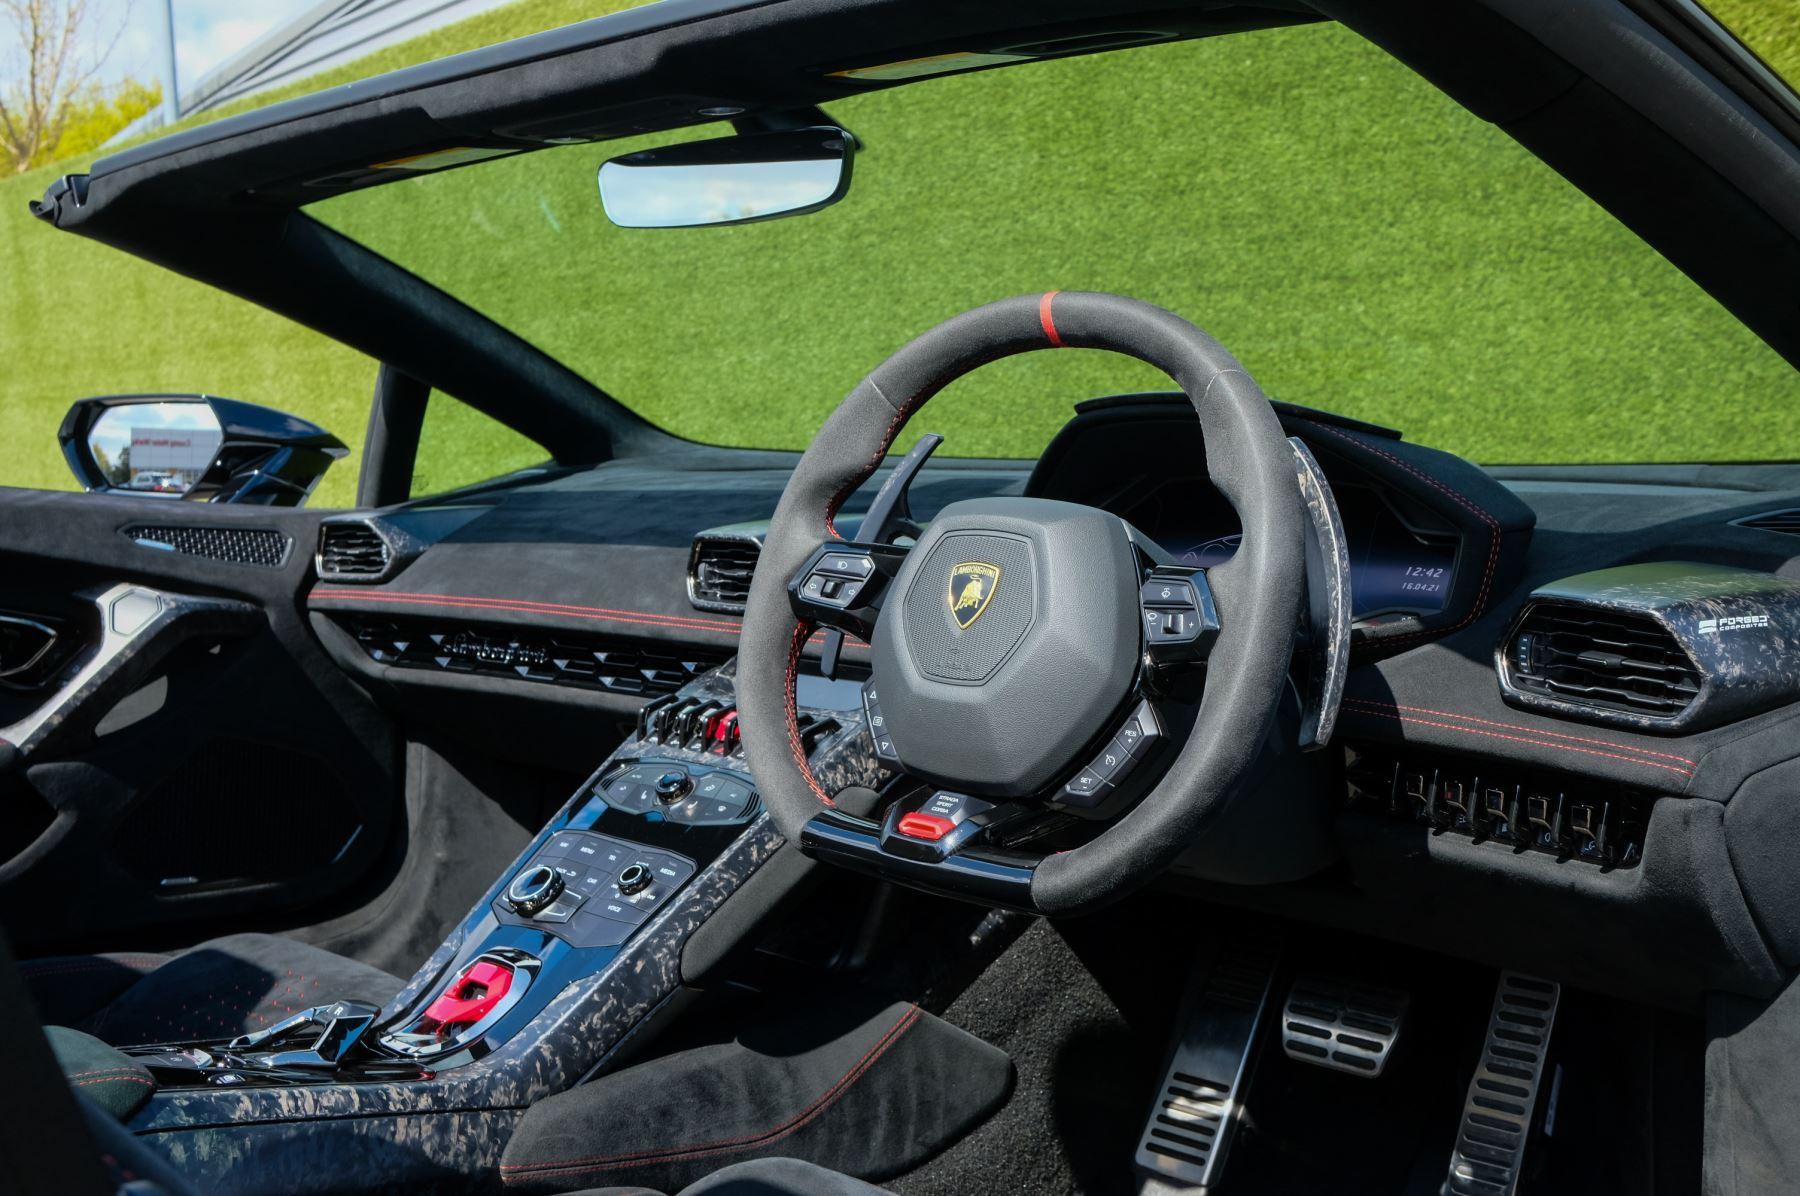 Lamborghini Huracan Performante Spyder 5.2 V10 AWD image 12